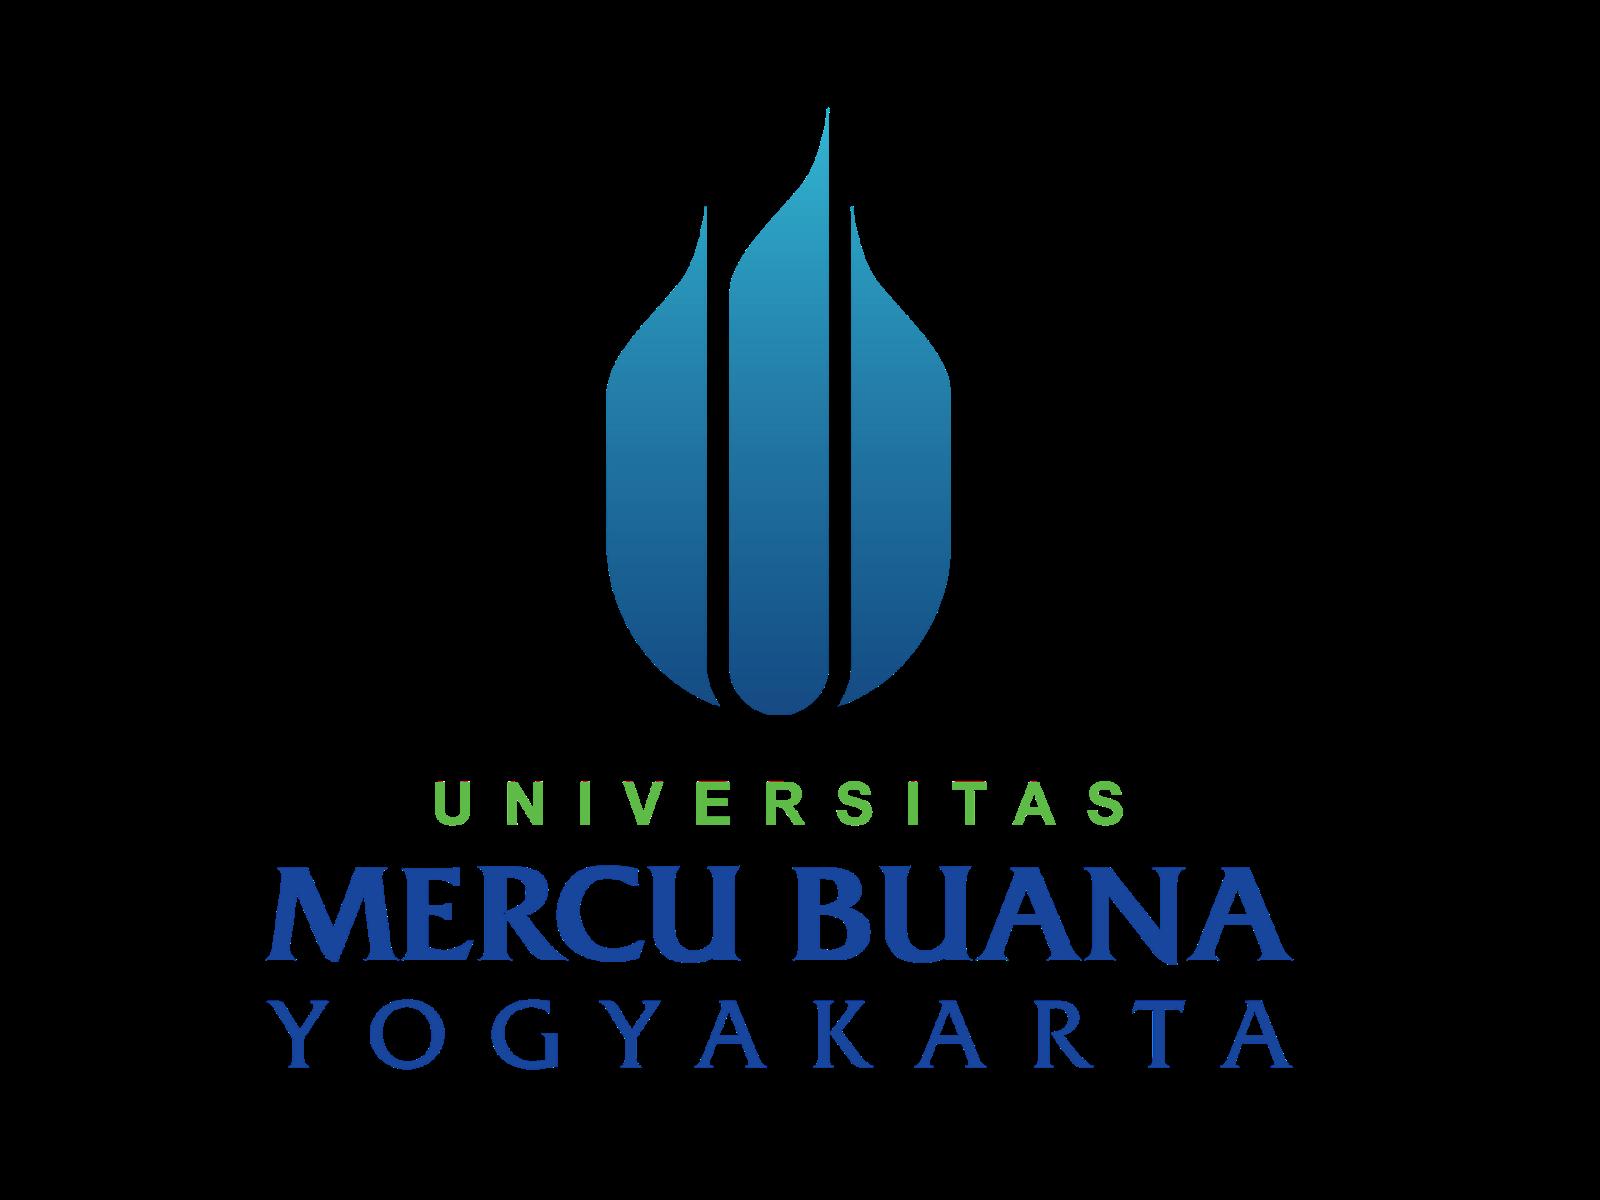 Logo Universitas Mercu Buana Yogyakarta (UMBY) Format PNG